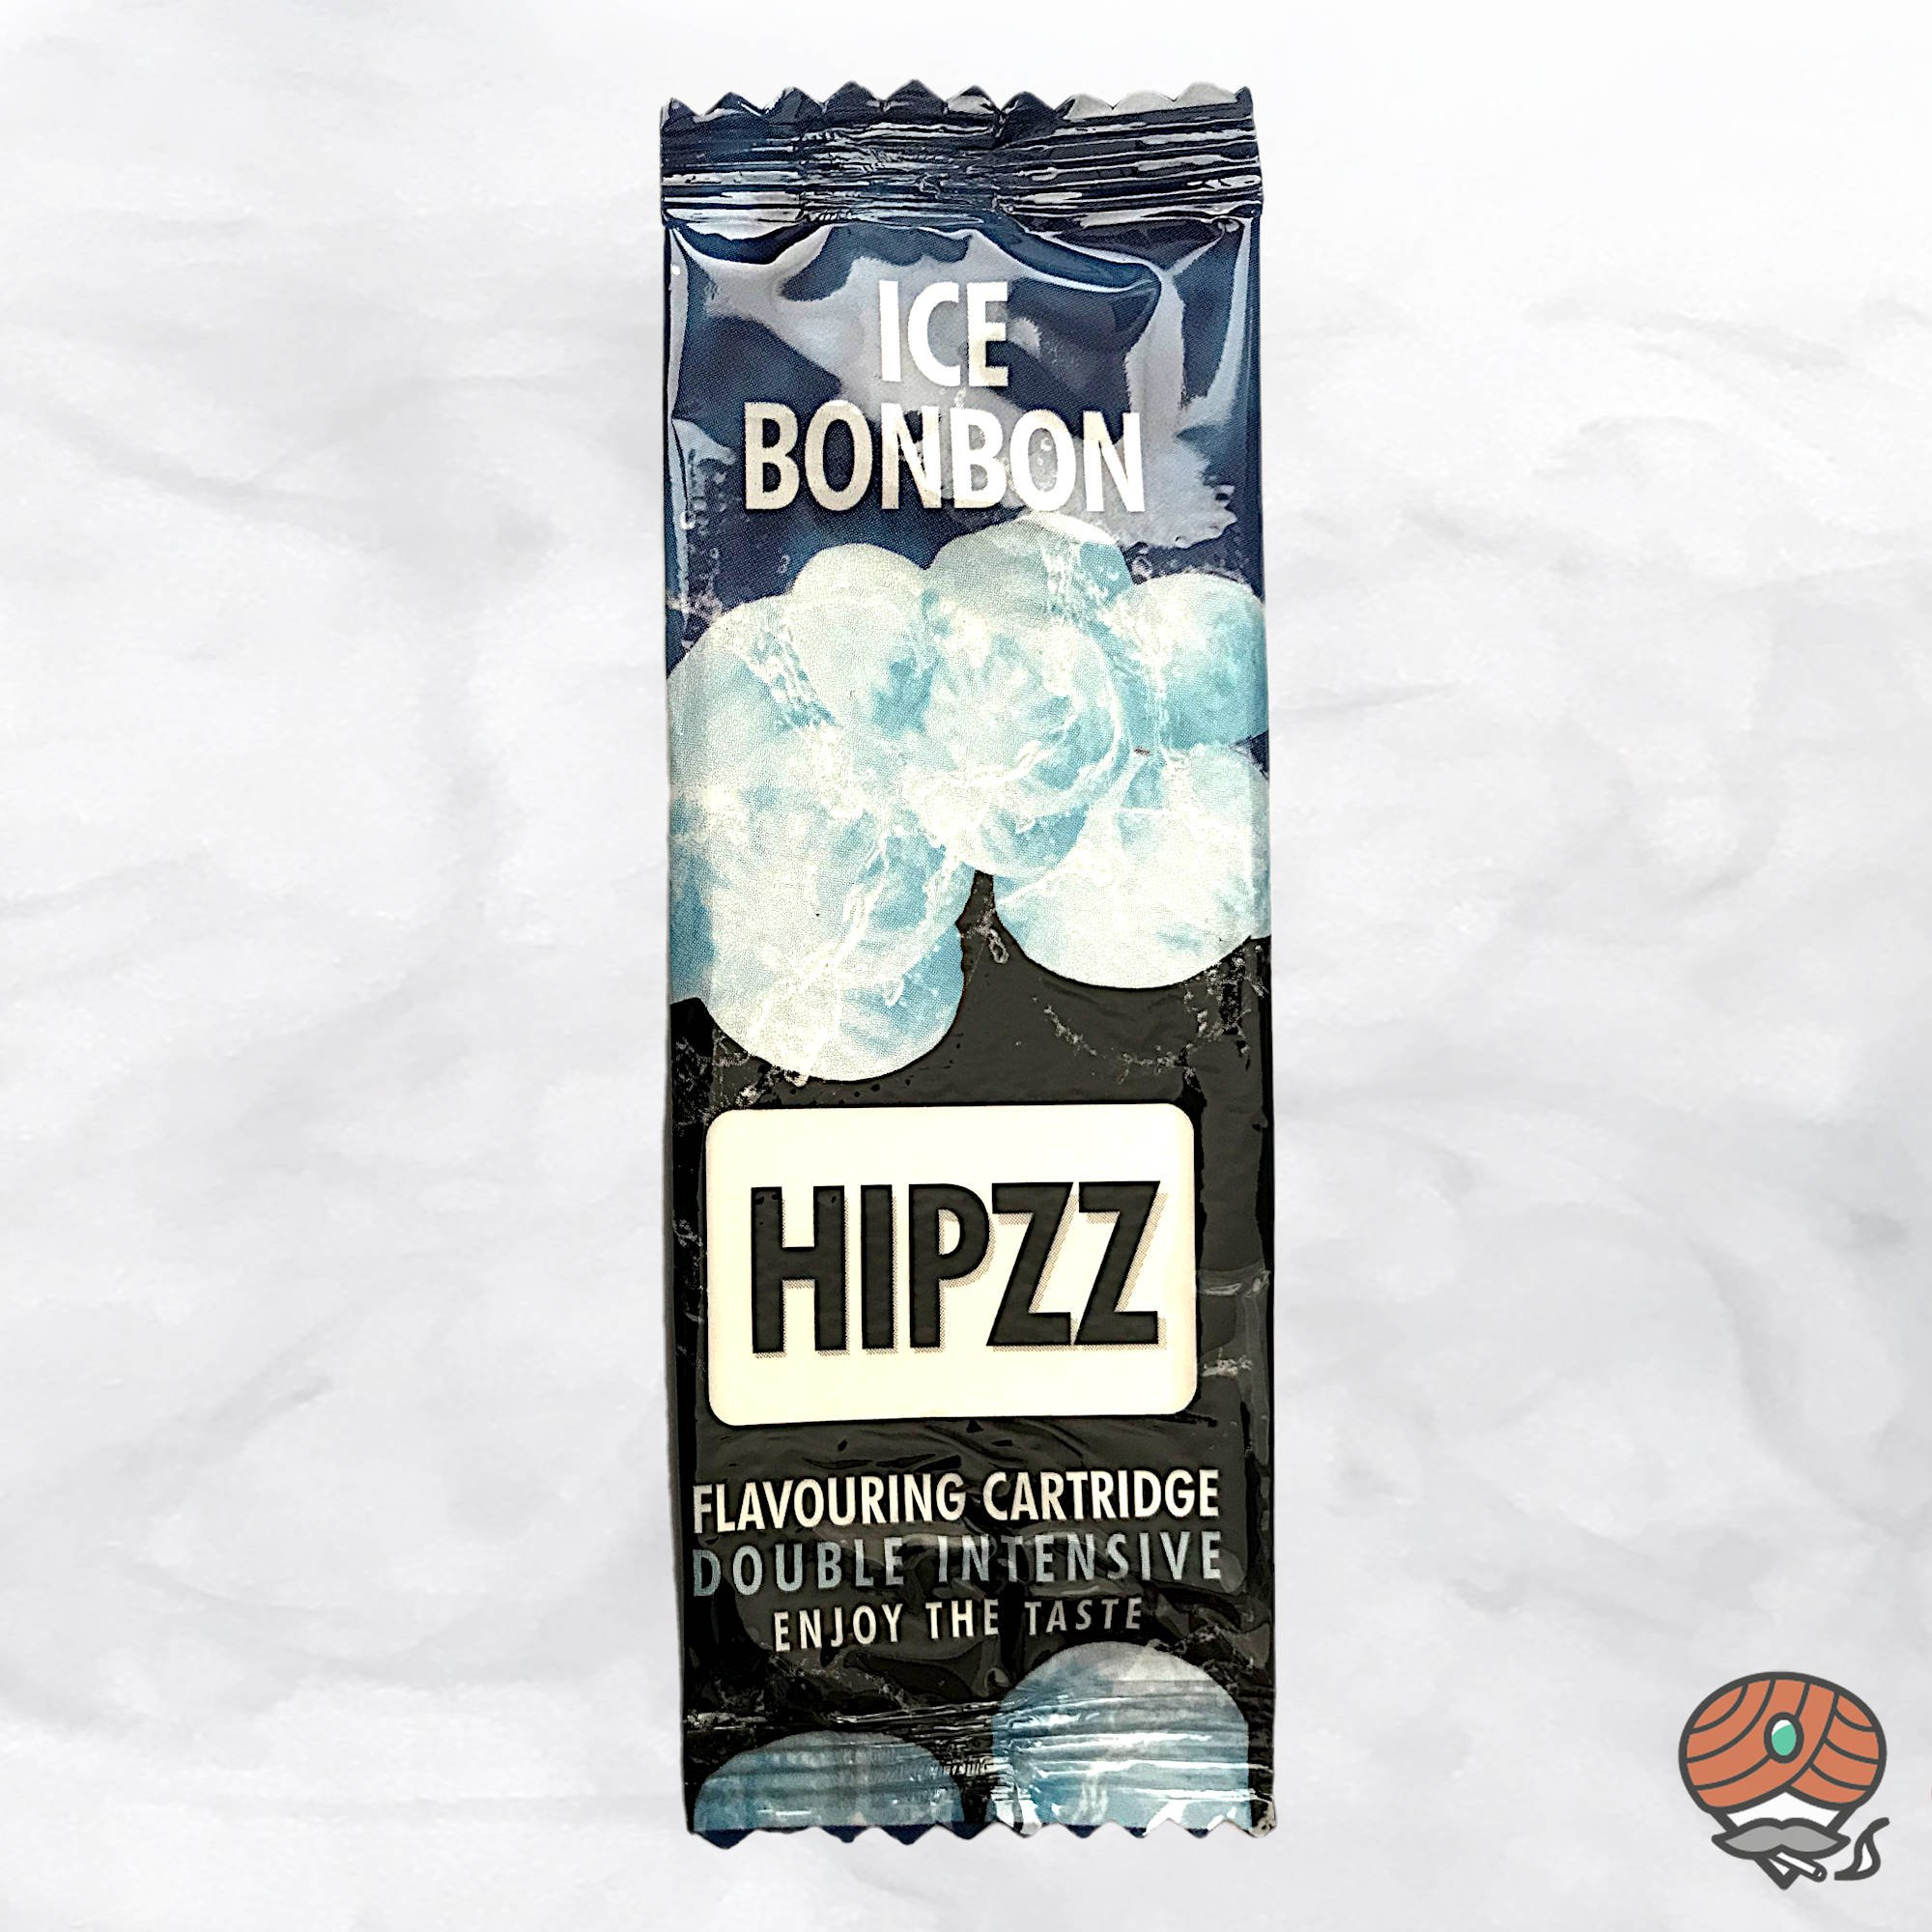 Aromakarte HIPZZ (wie Rizla) ICE BONBON - Aroma für Tabak